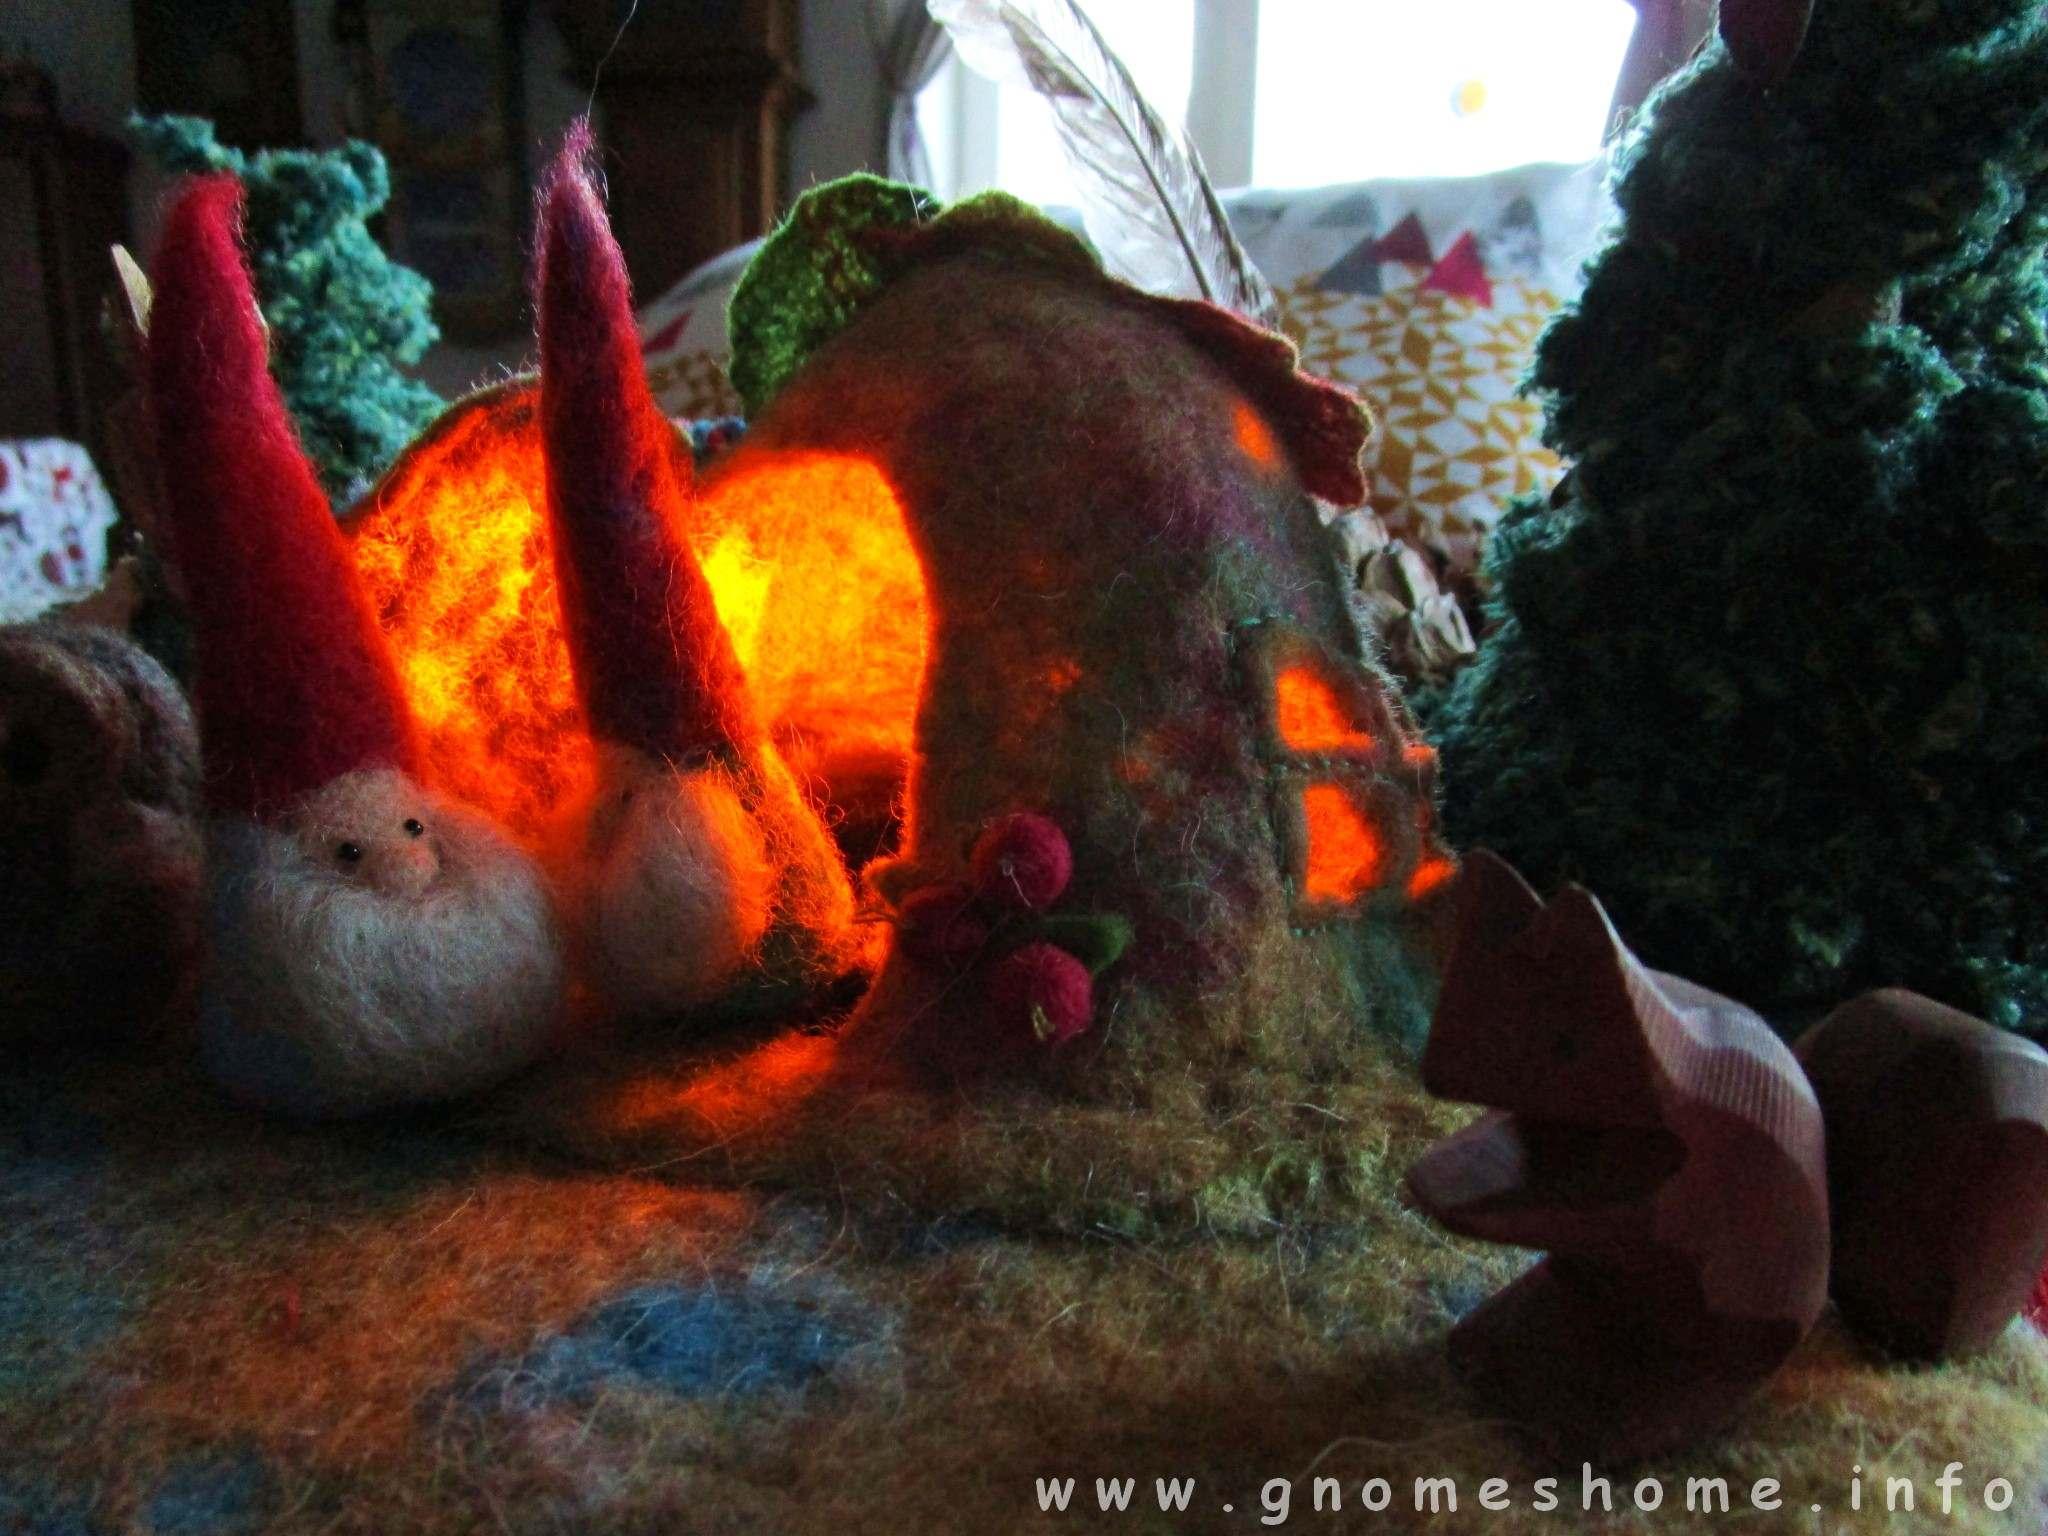 gnomeshome